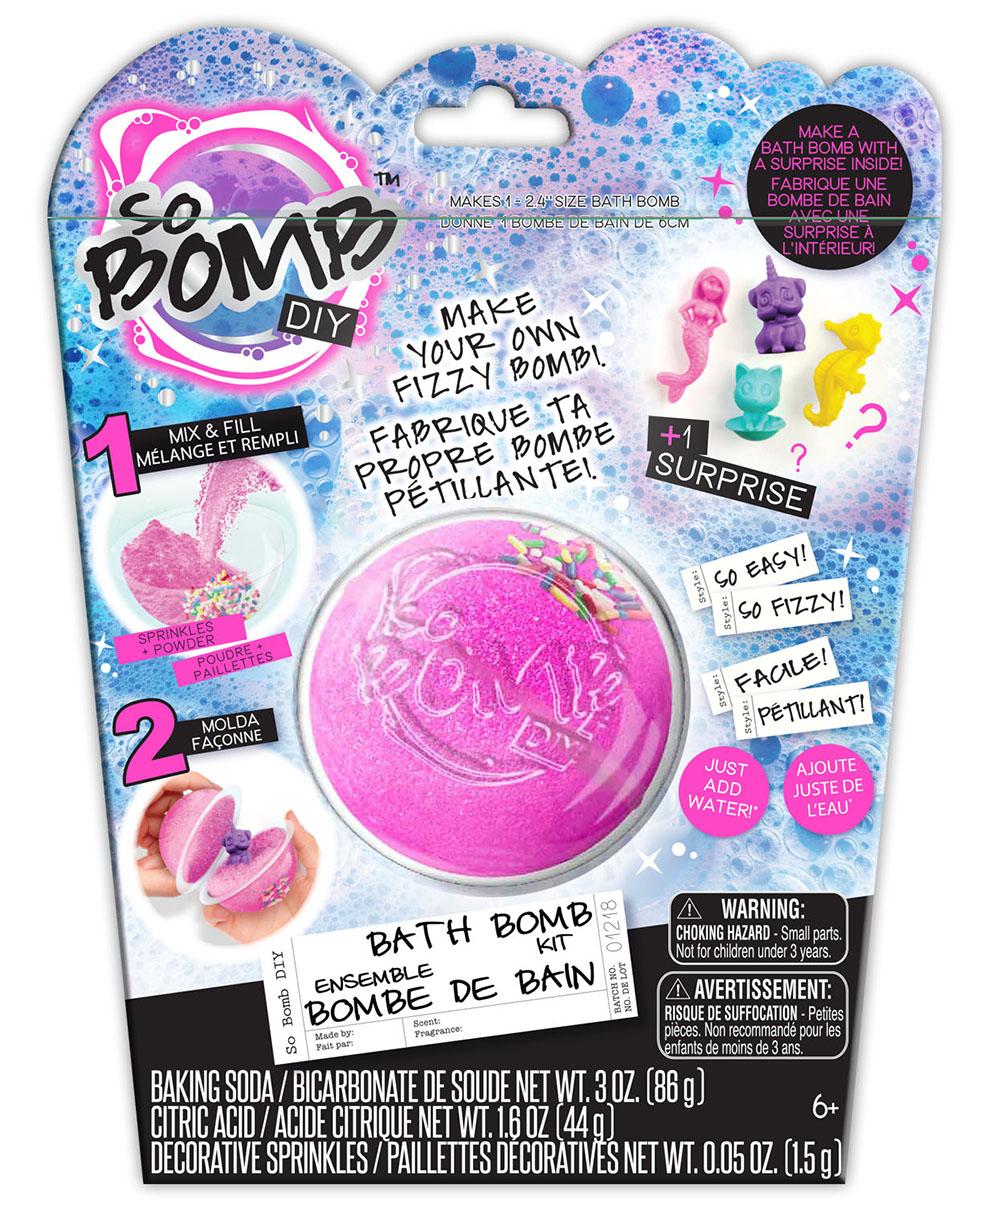 So Bomb DIY Ensemble bombe de bain